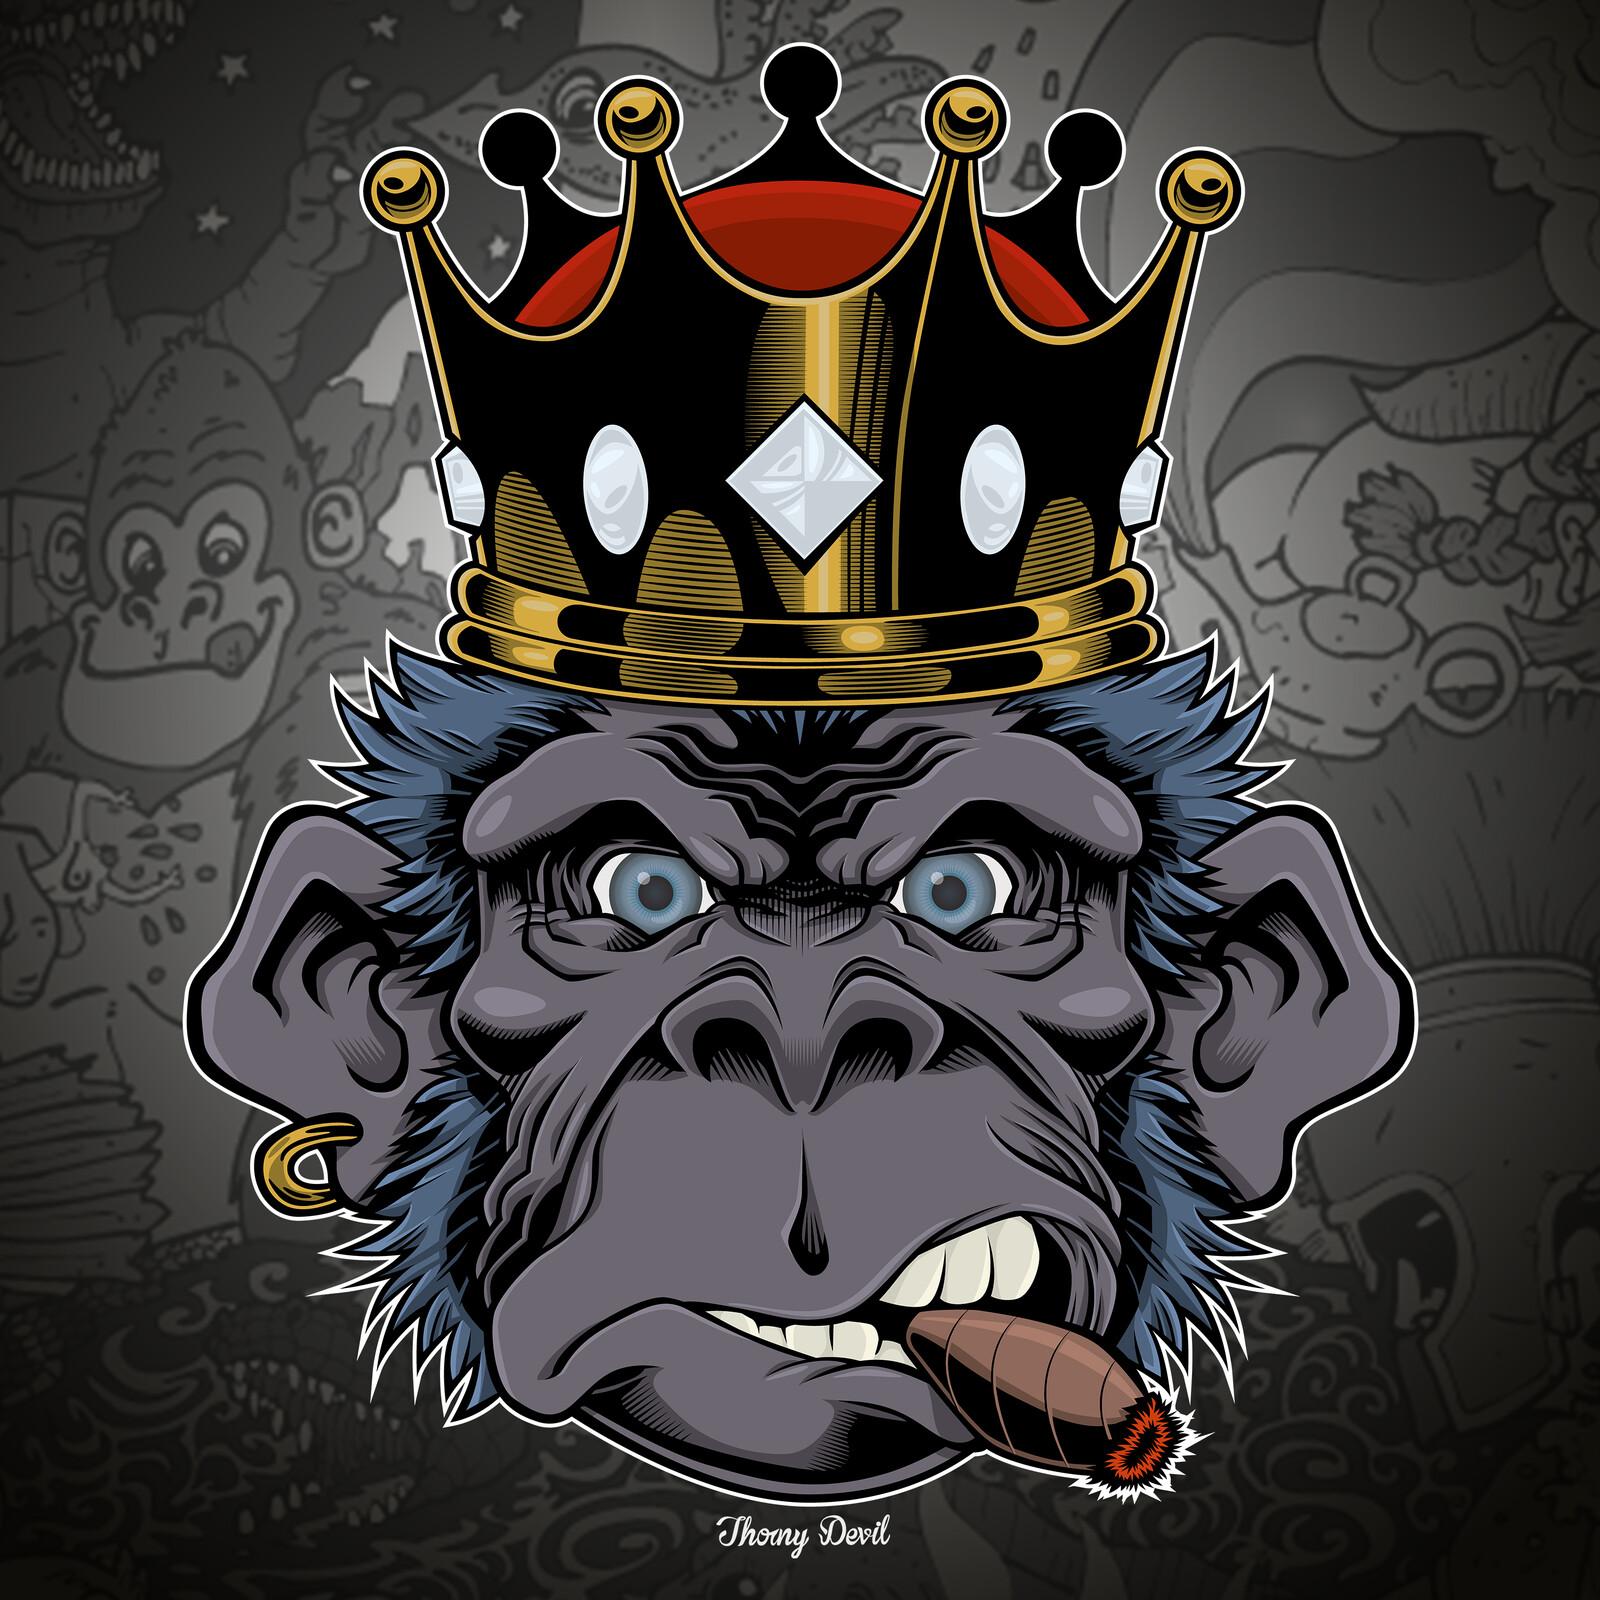 The Chimp Pimp